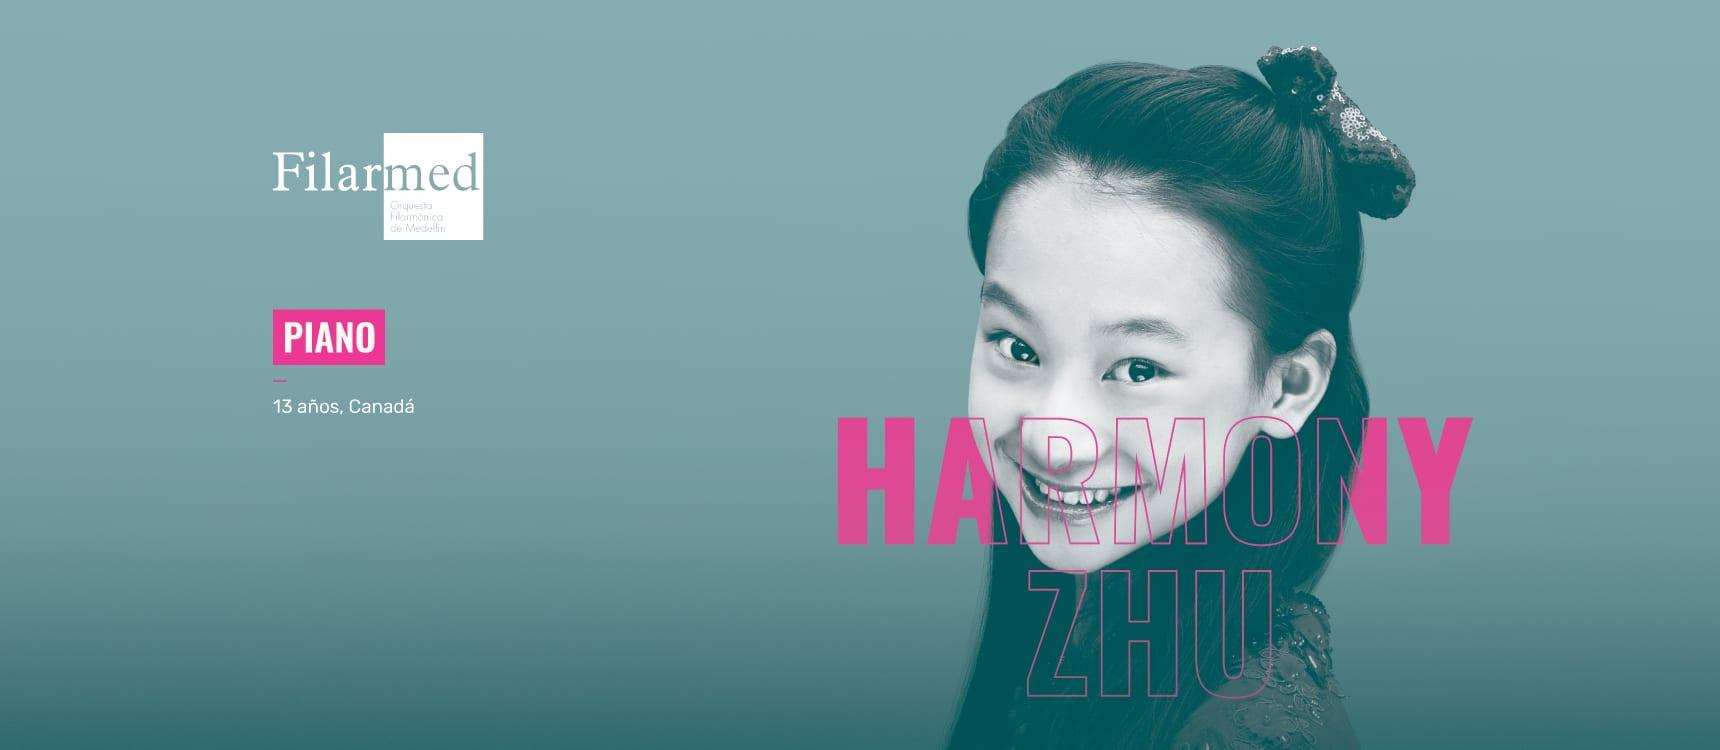 Harmony Zhu y Filarmed